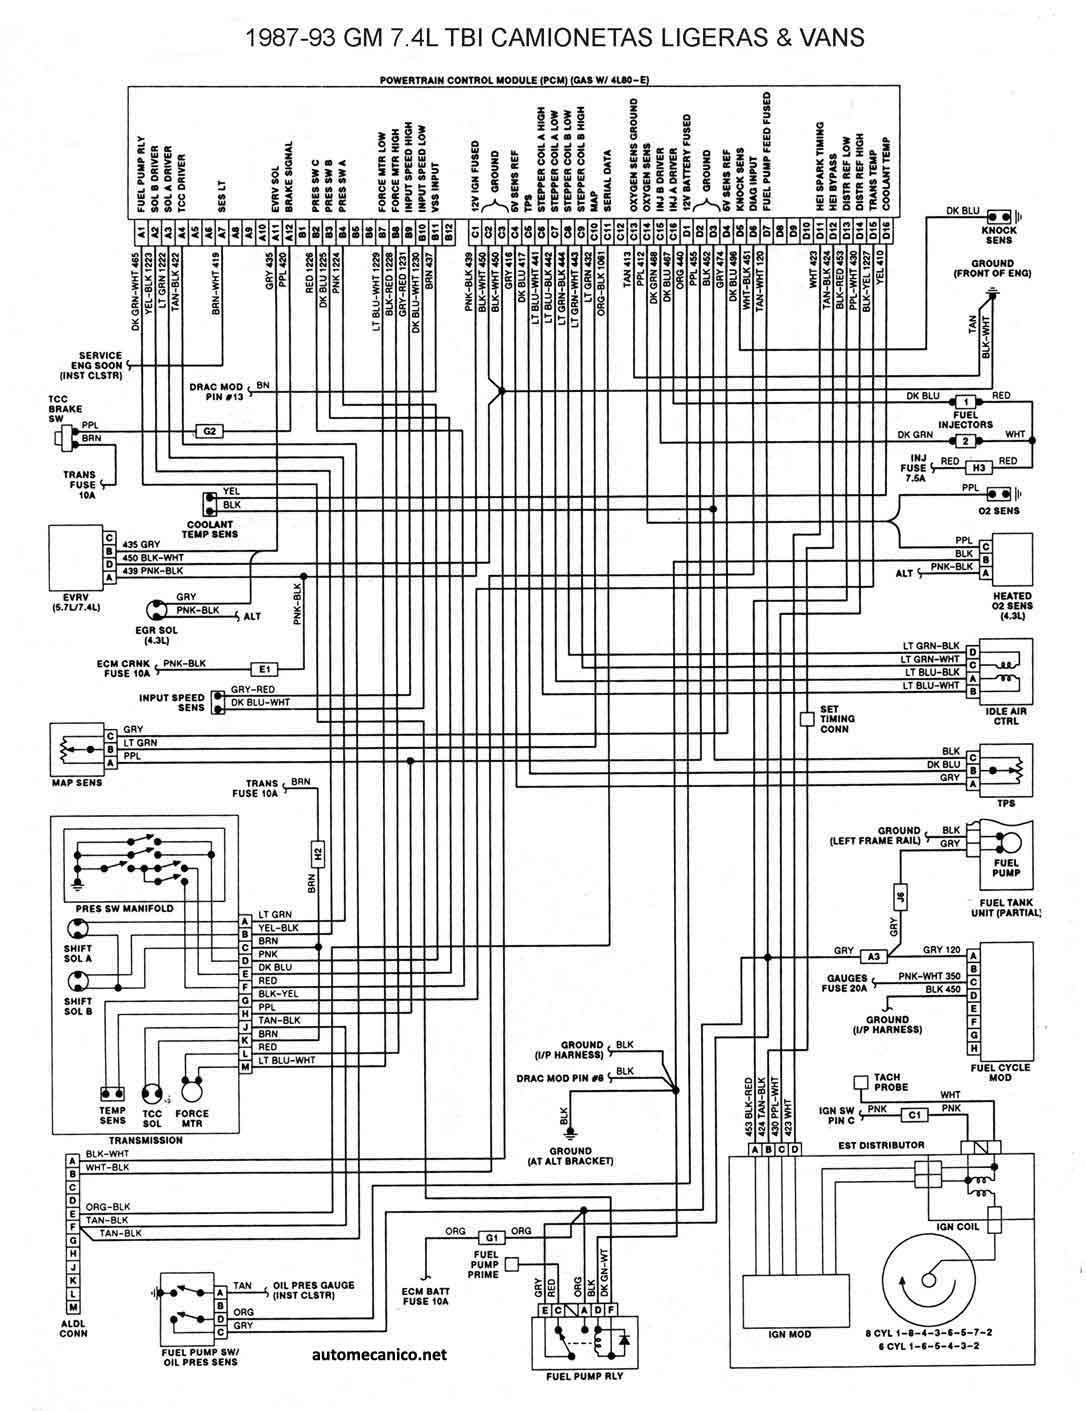 Qashqai Fuse Box Diagram : Nissan qashqai fuse diagram lexus elsavadorla